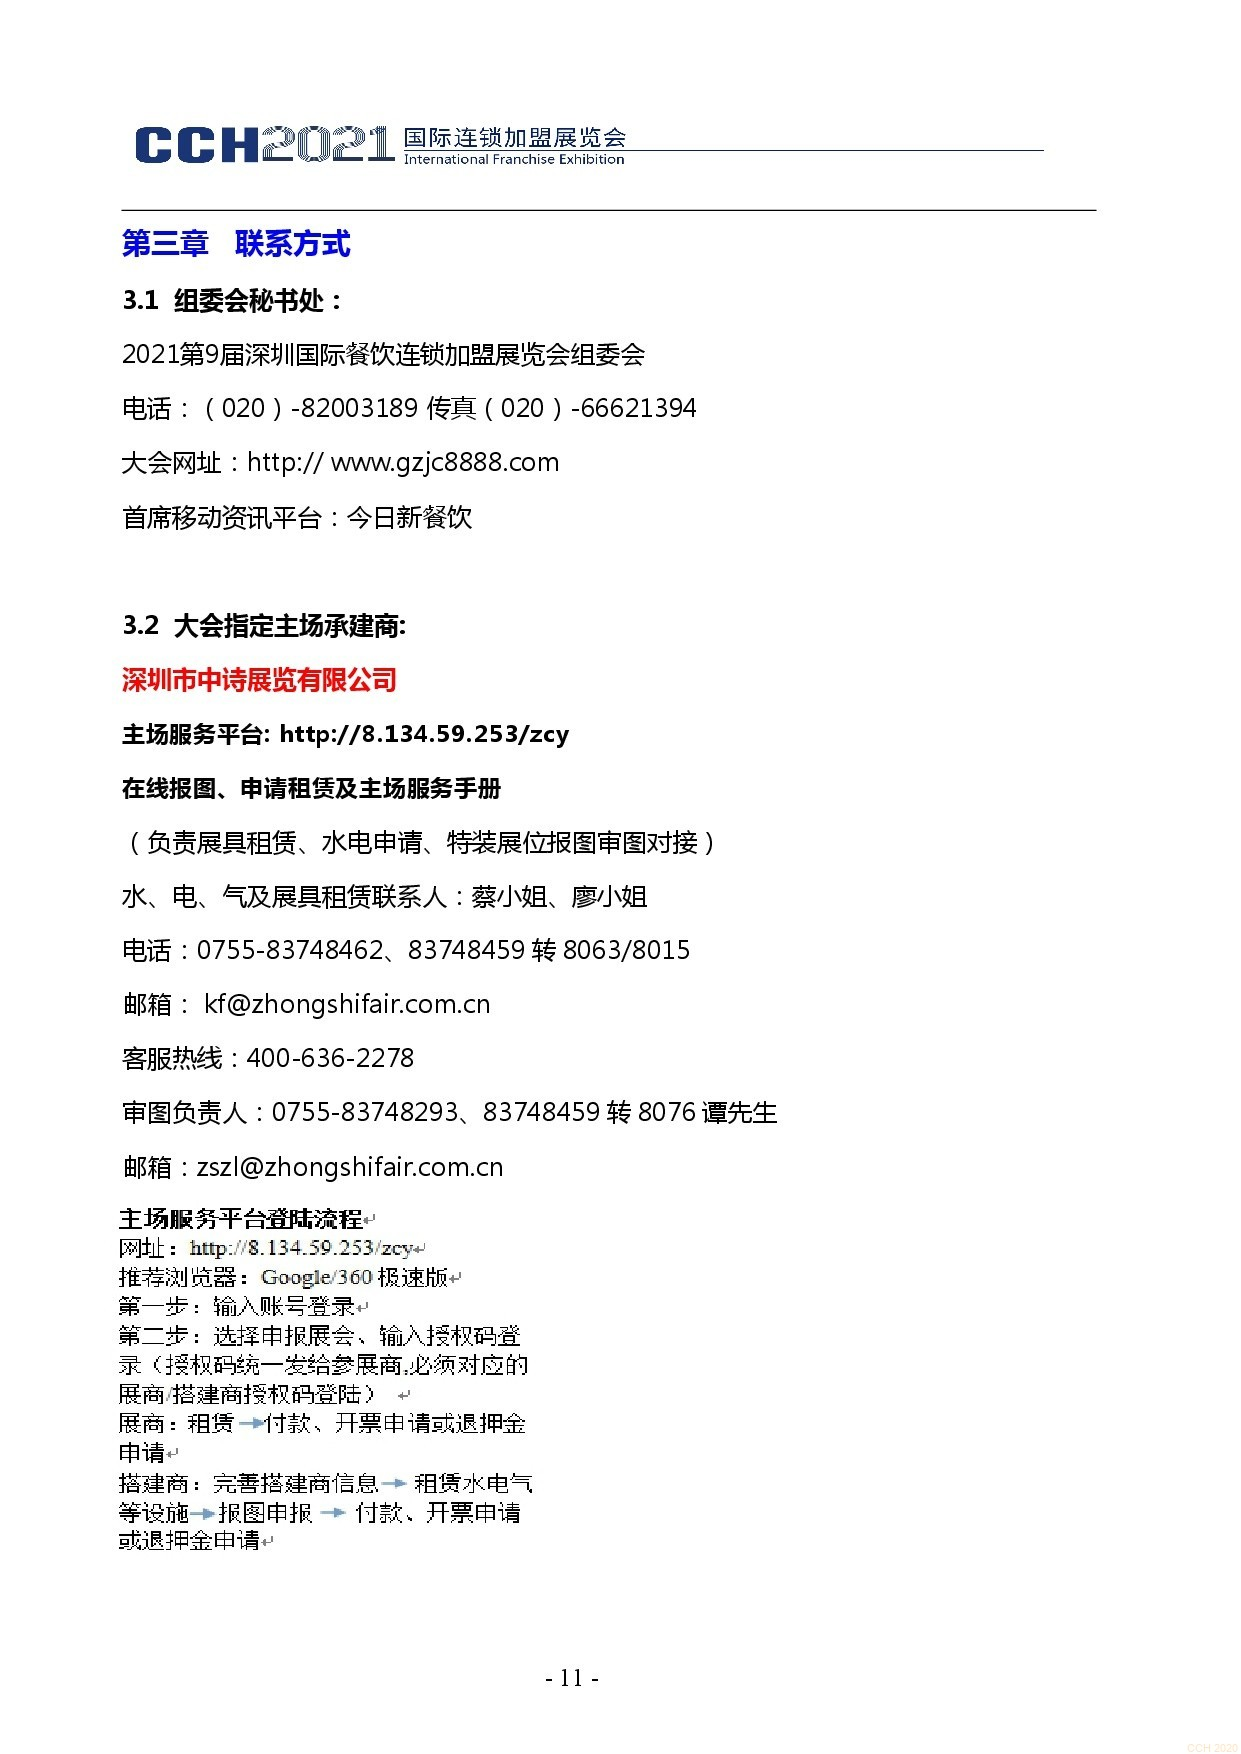 0416CCH深圳展参展商手册4.16-011.jpg